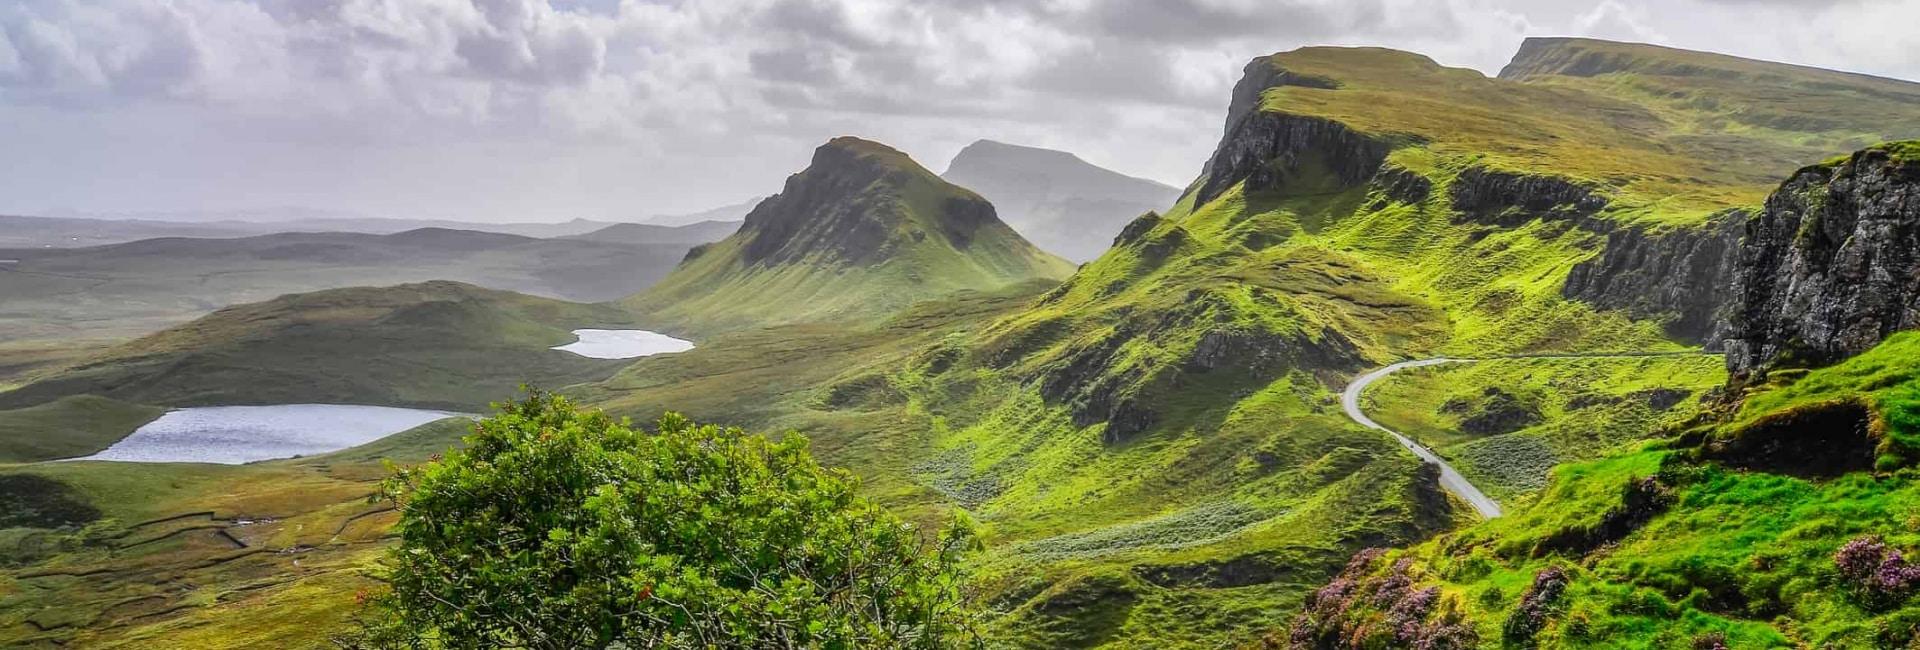 Den store Skotland